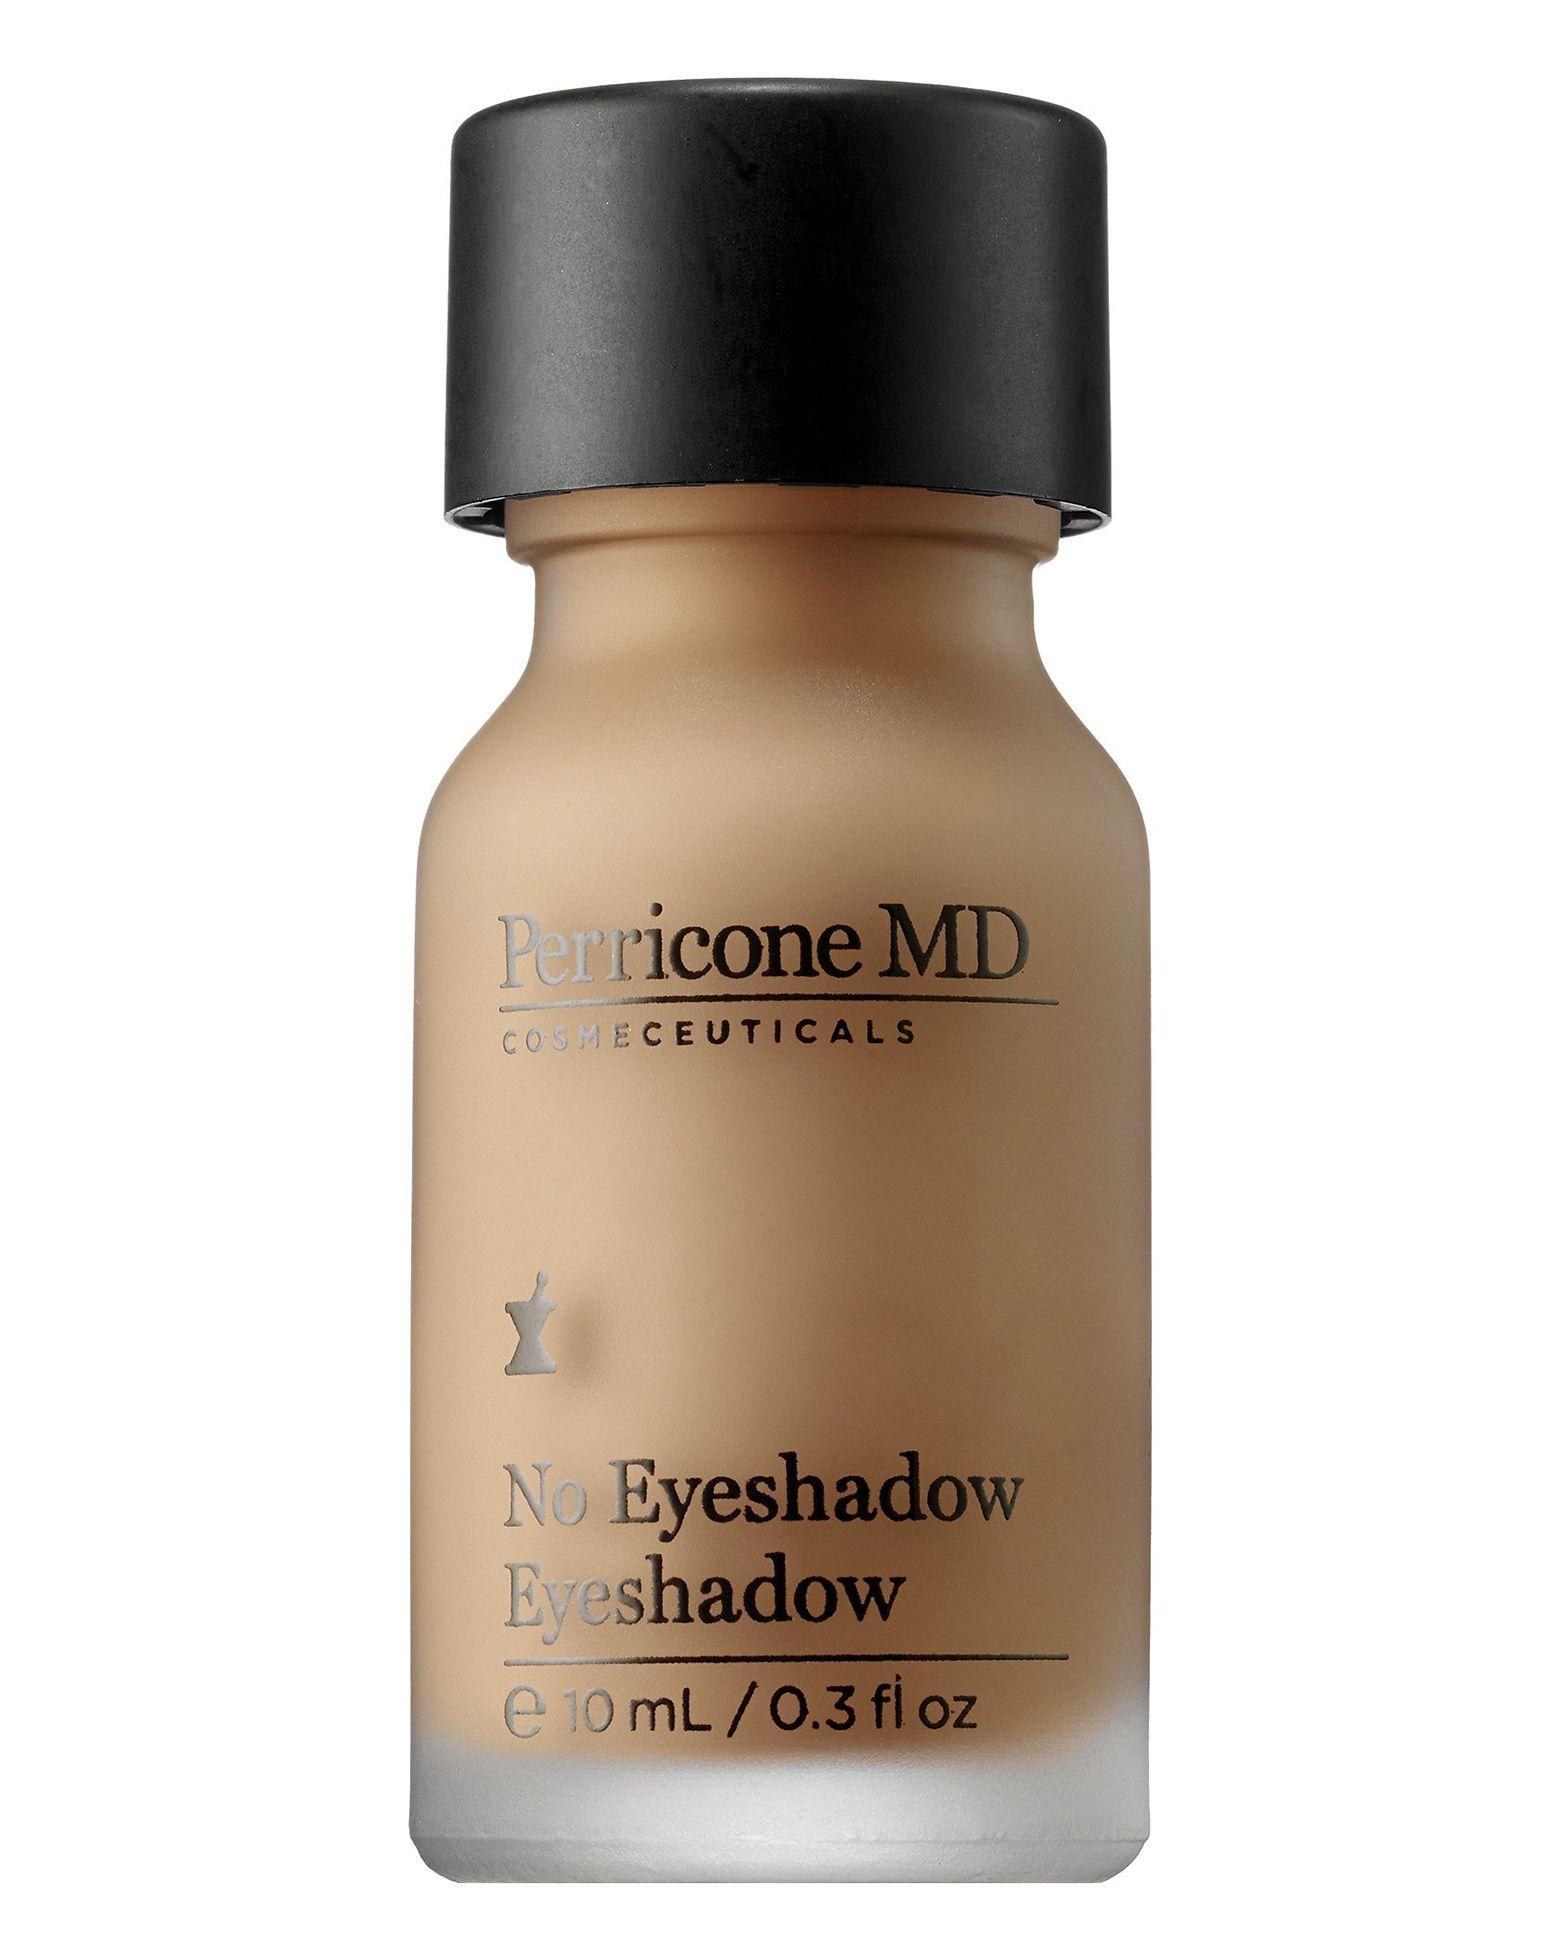 No Eyeshadow Eyeshadow by Perricone MD Eyeshadow, Makeup